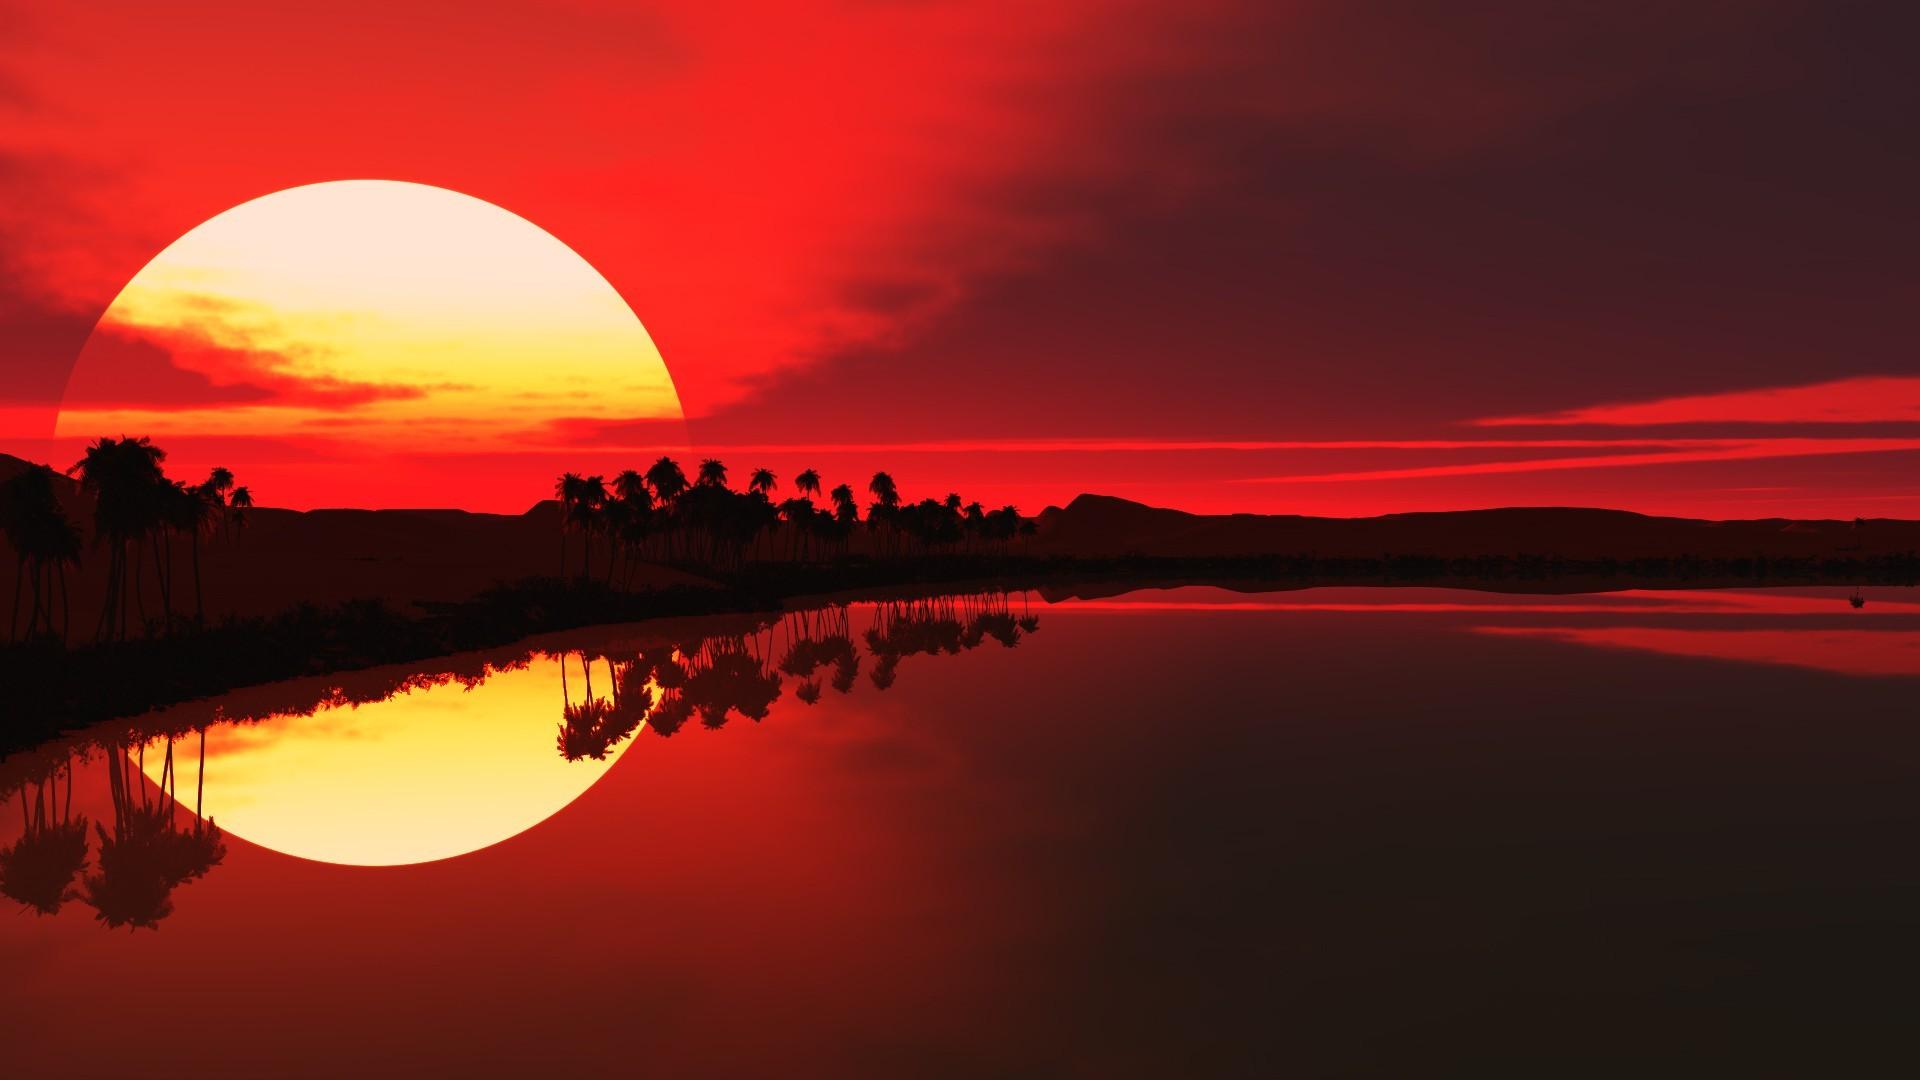 1920x1080 px nature reflection sky Sun sunlight sunset trees water